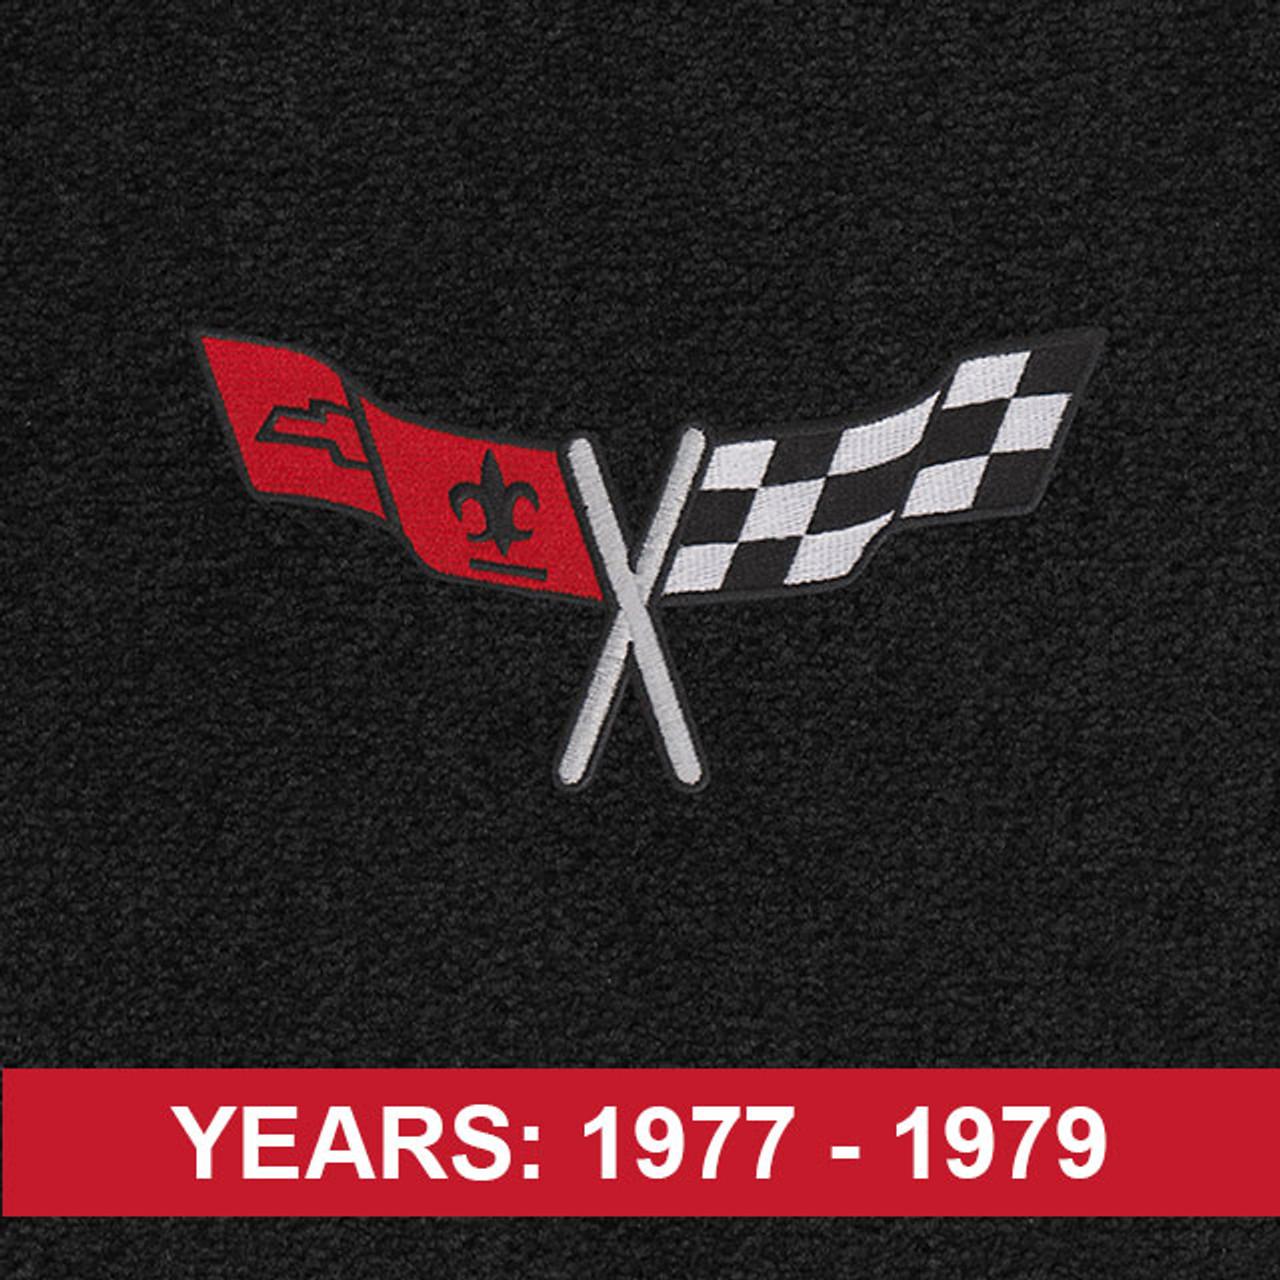 1977-1979 Cross Flags